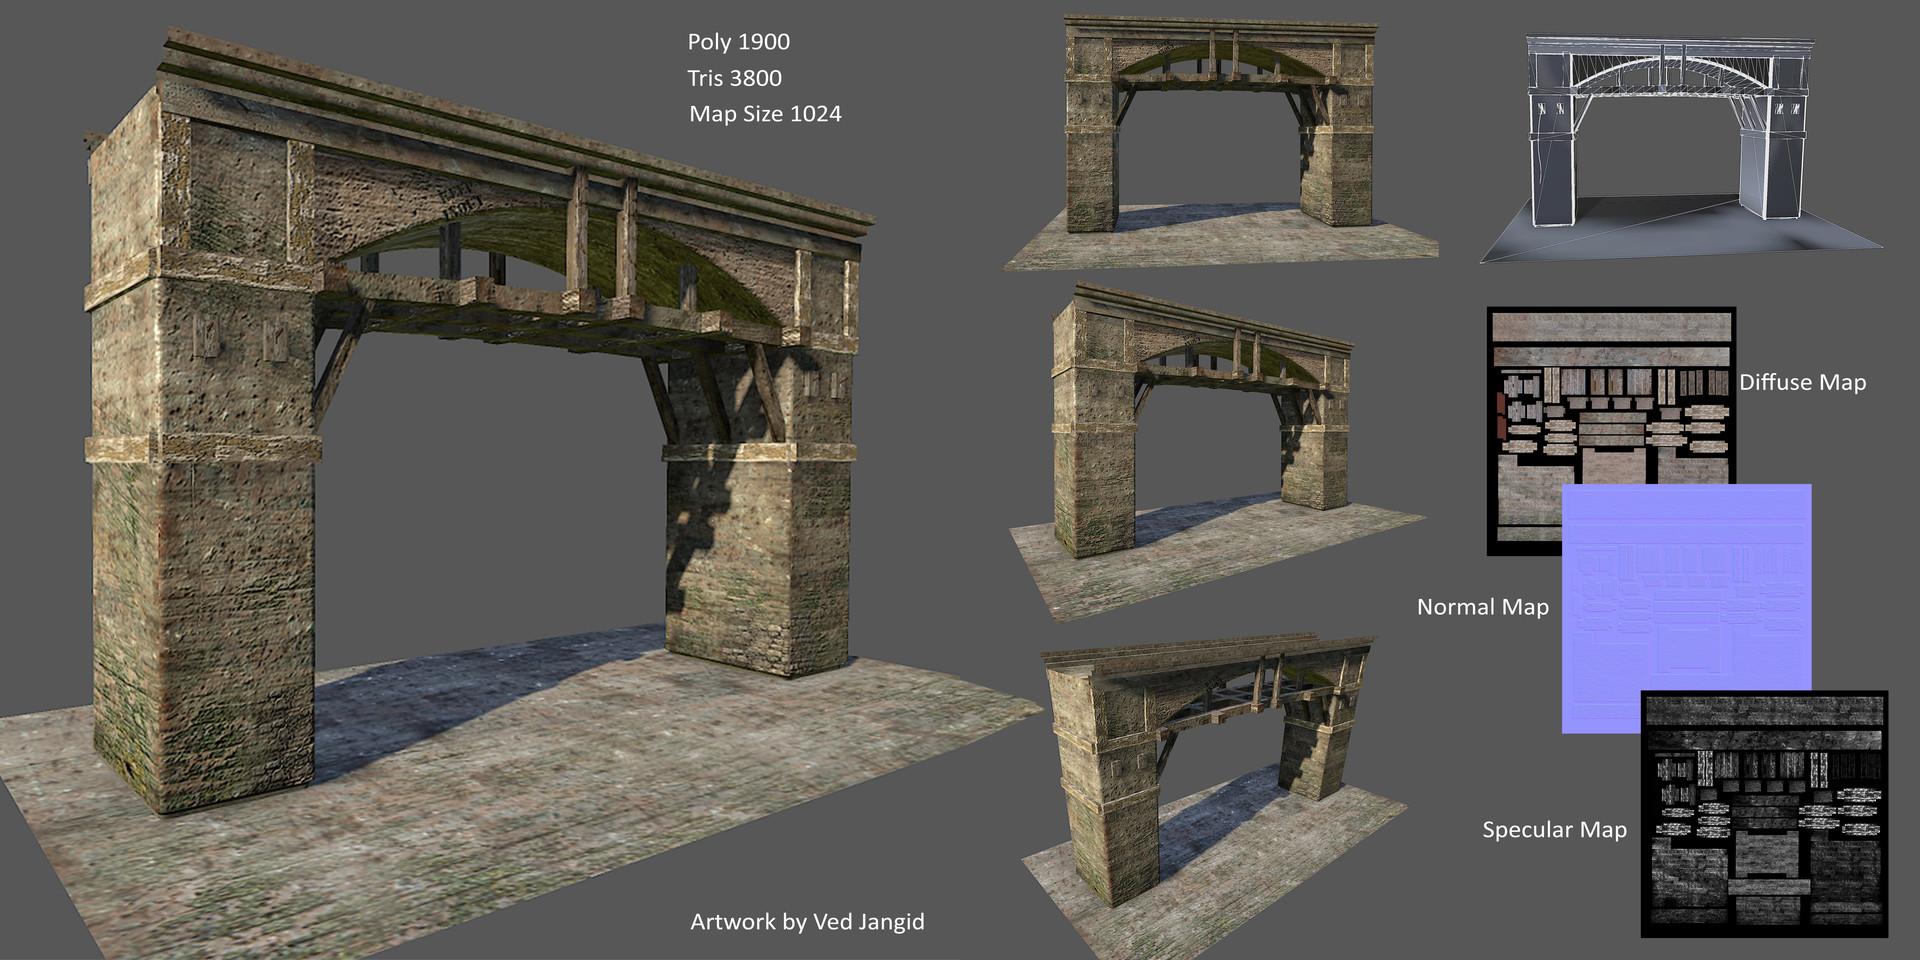 Vedprakash jangid game environment model for Make a house online for free 3d